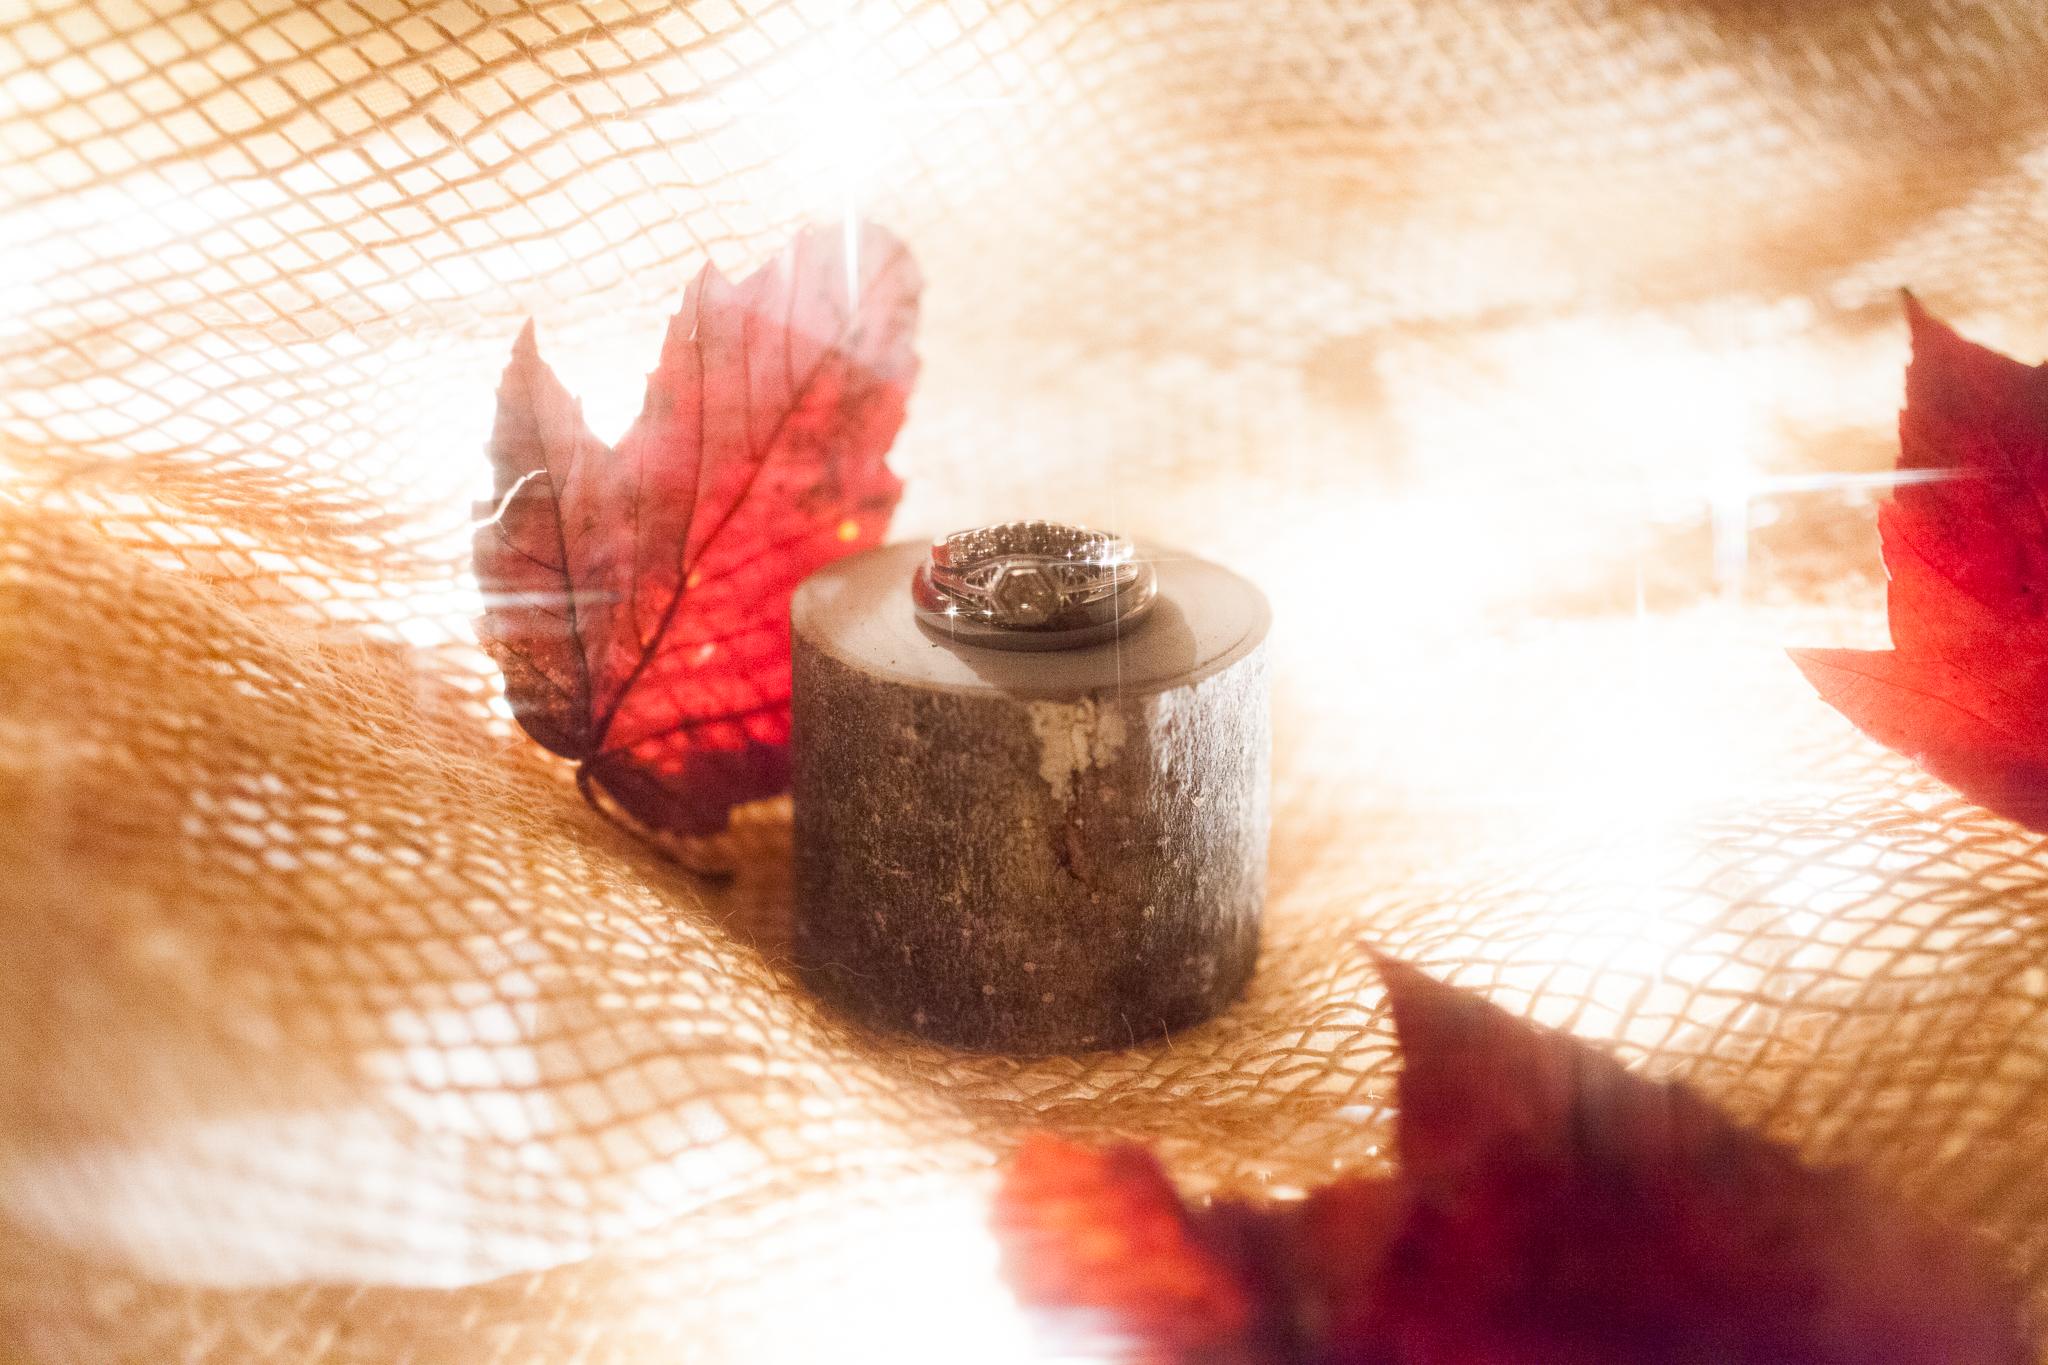 camuglia-whomstudio-chelsea_and_andy-nycphotographer-wedding-brooklyn-buffalo-timberlodge-003-1082.jpg